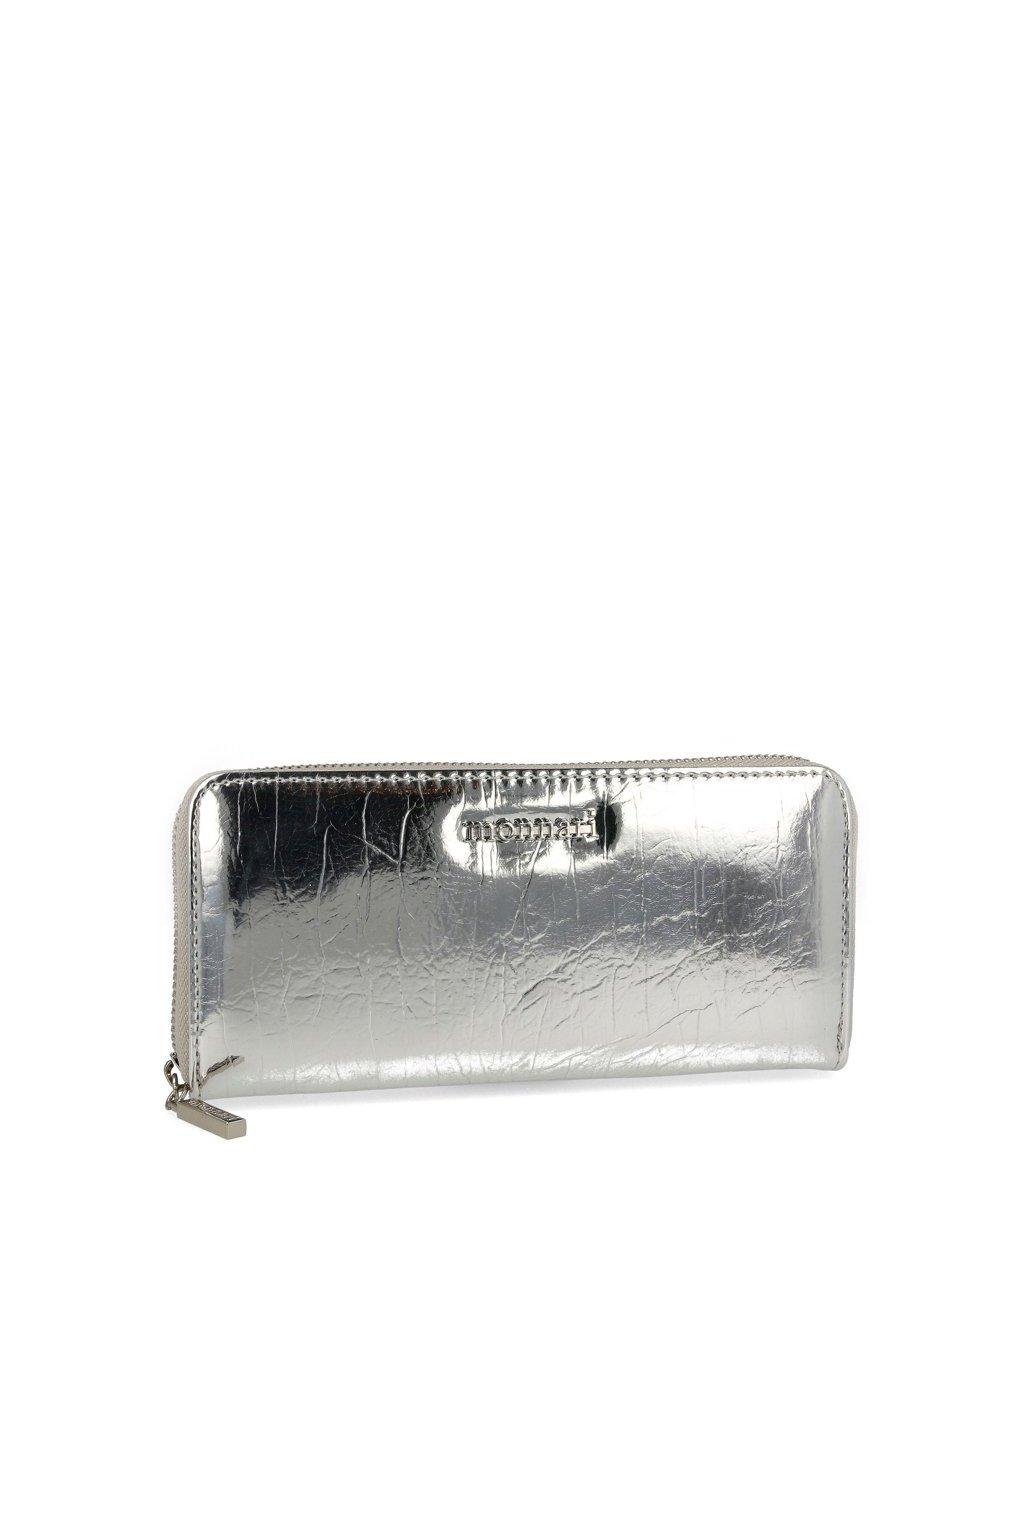 Peňaženka farba sivá kód PUR0100-M22